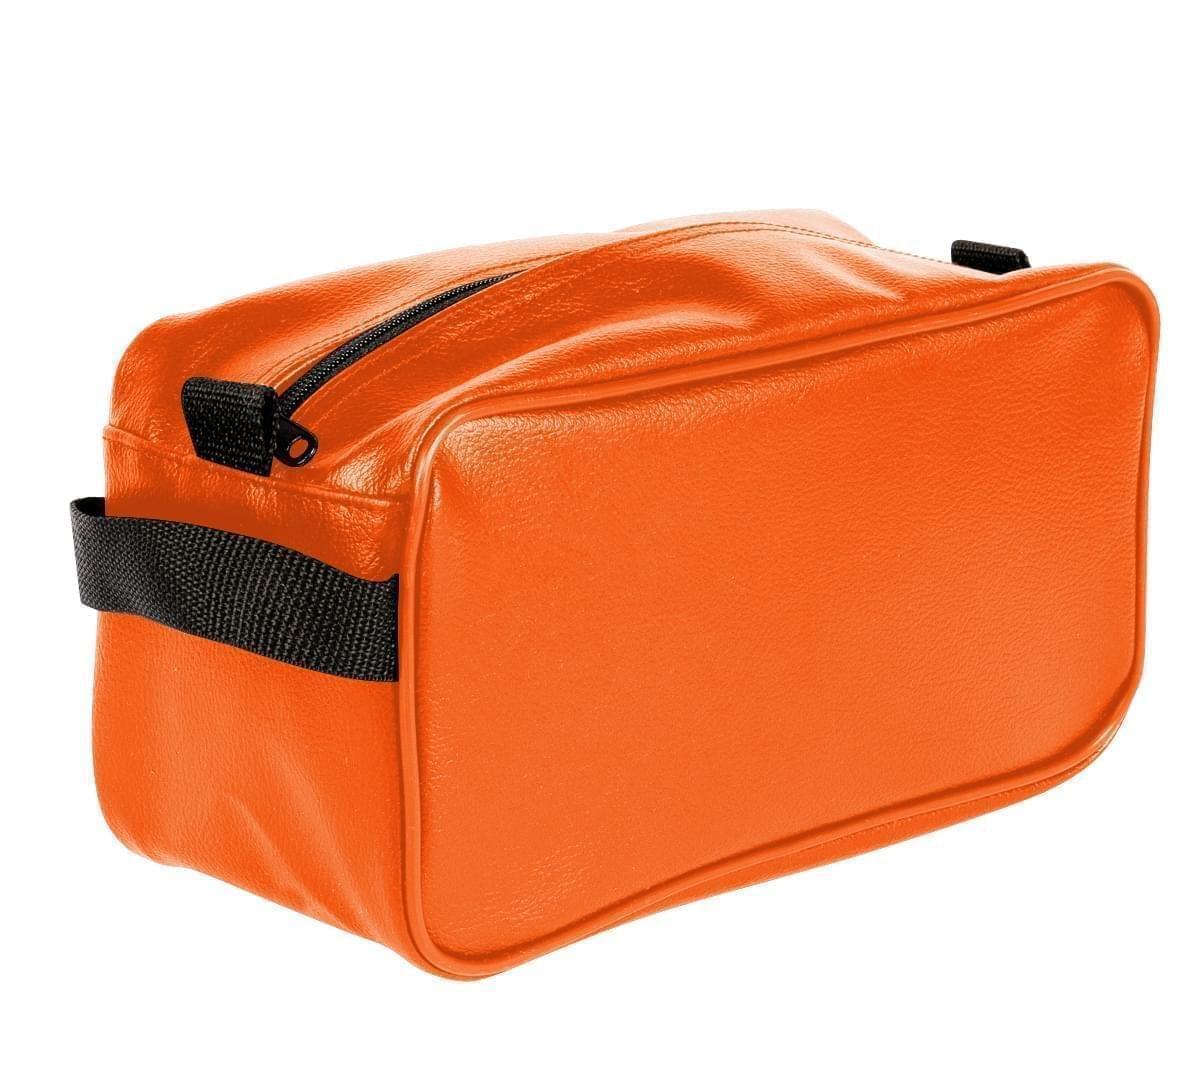 USA Made Cosmetic & Toiletry Cases, Orange-Black, 3000996-AXR